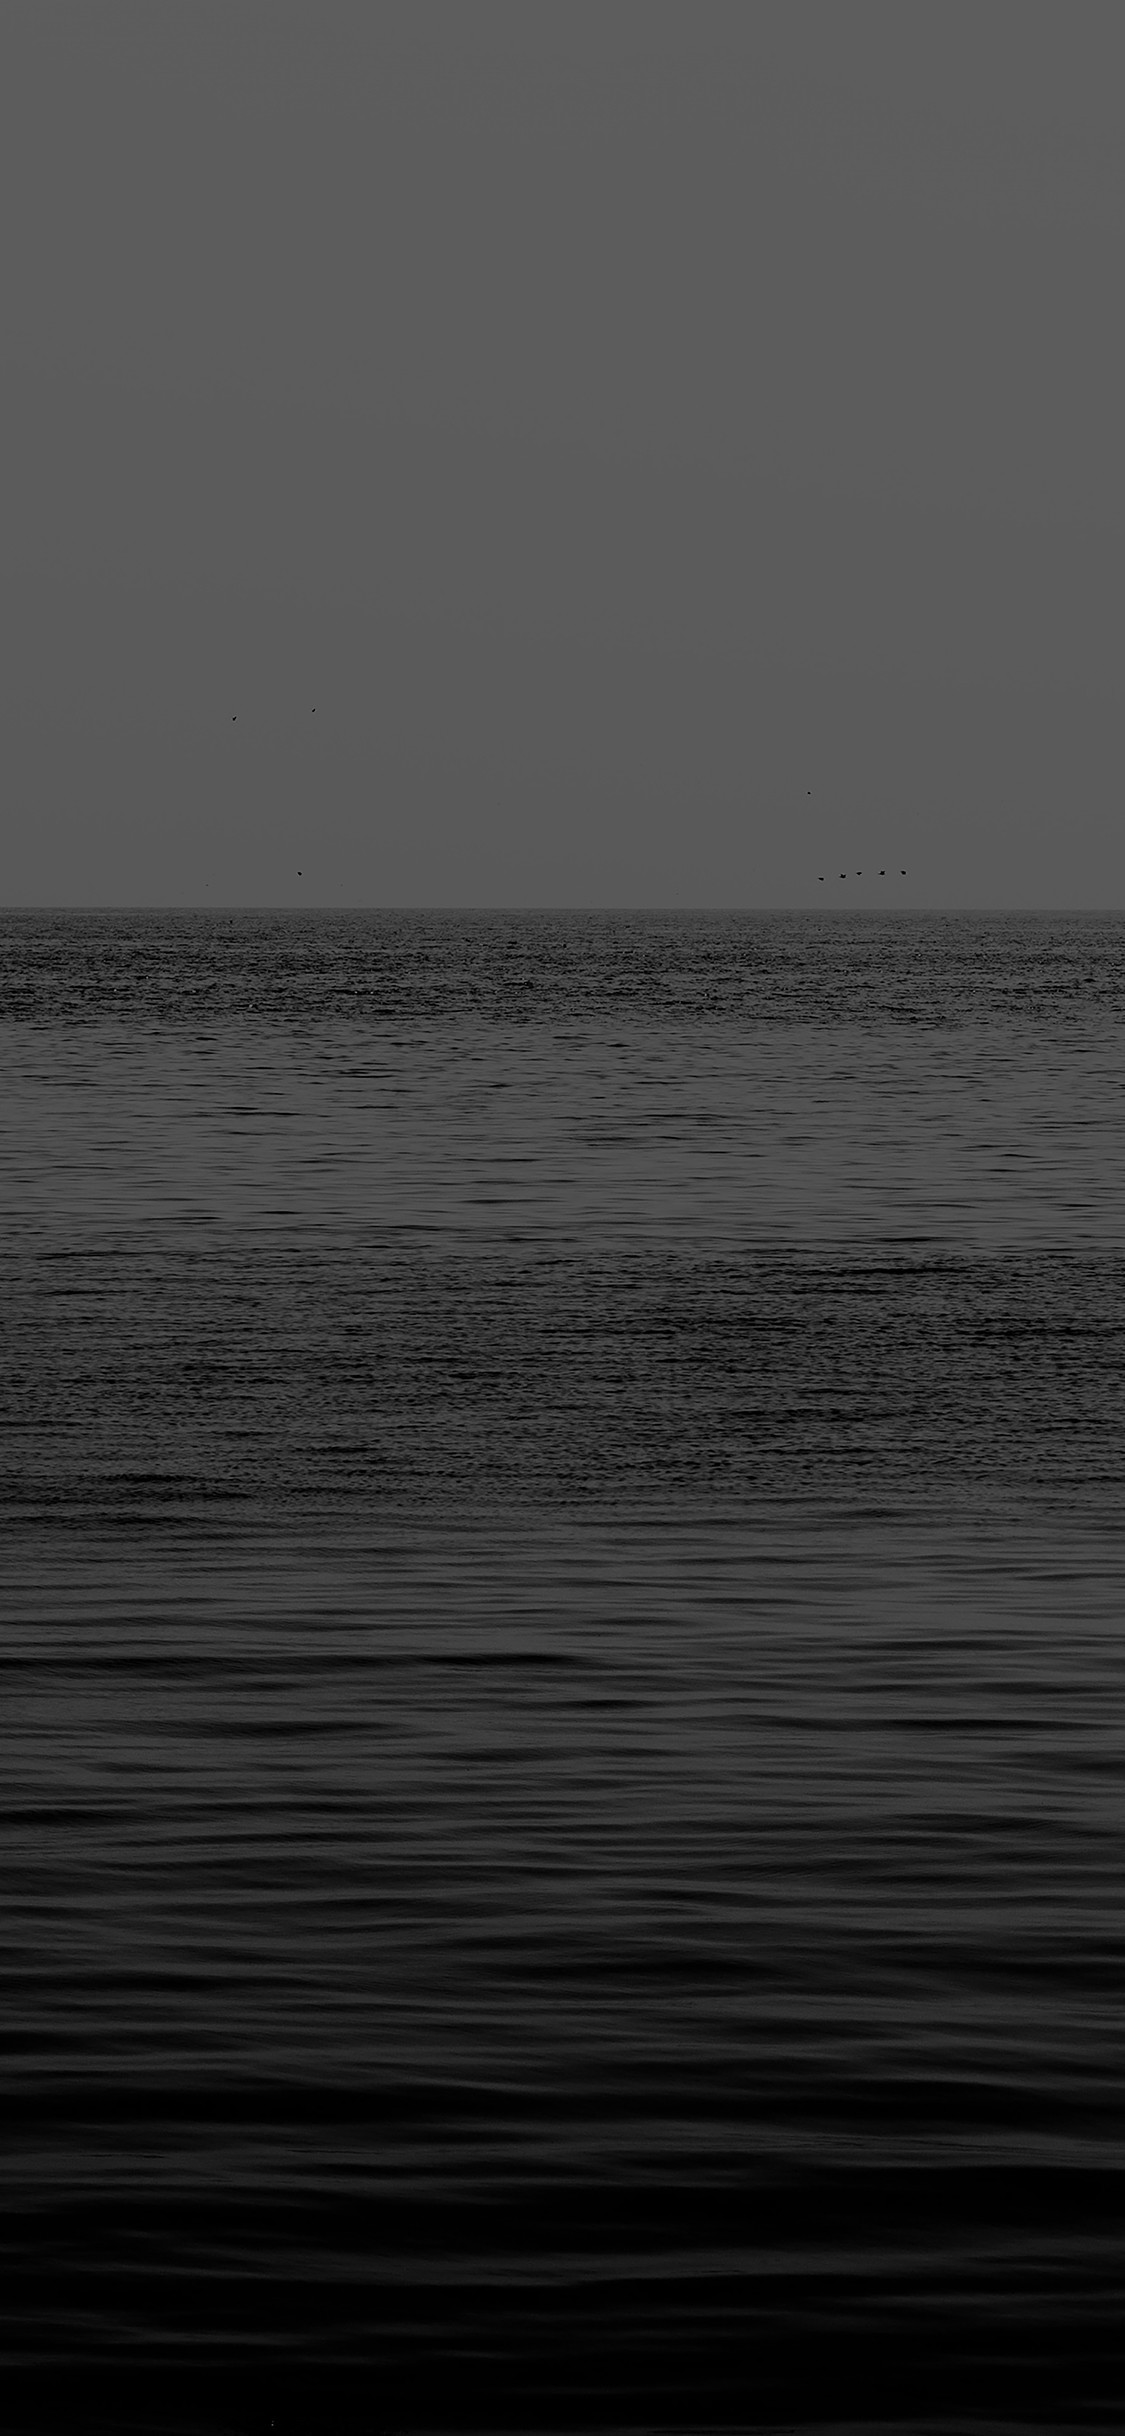 Flat Black Wallpaper 75 Images